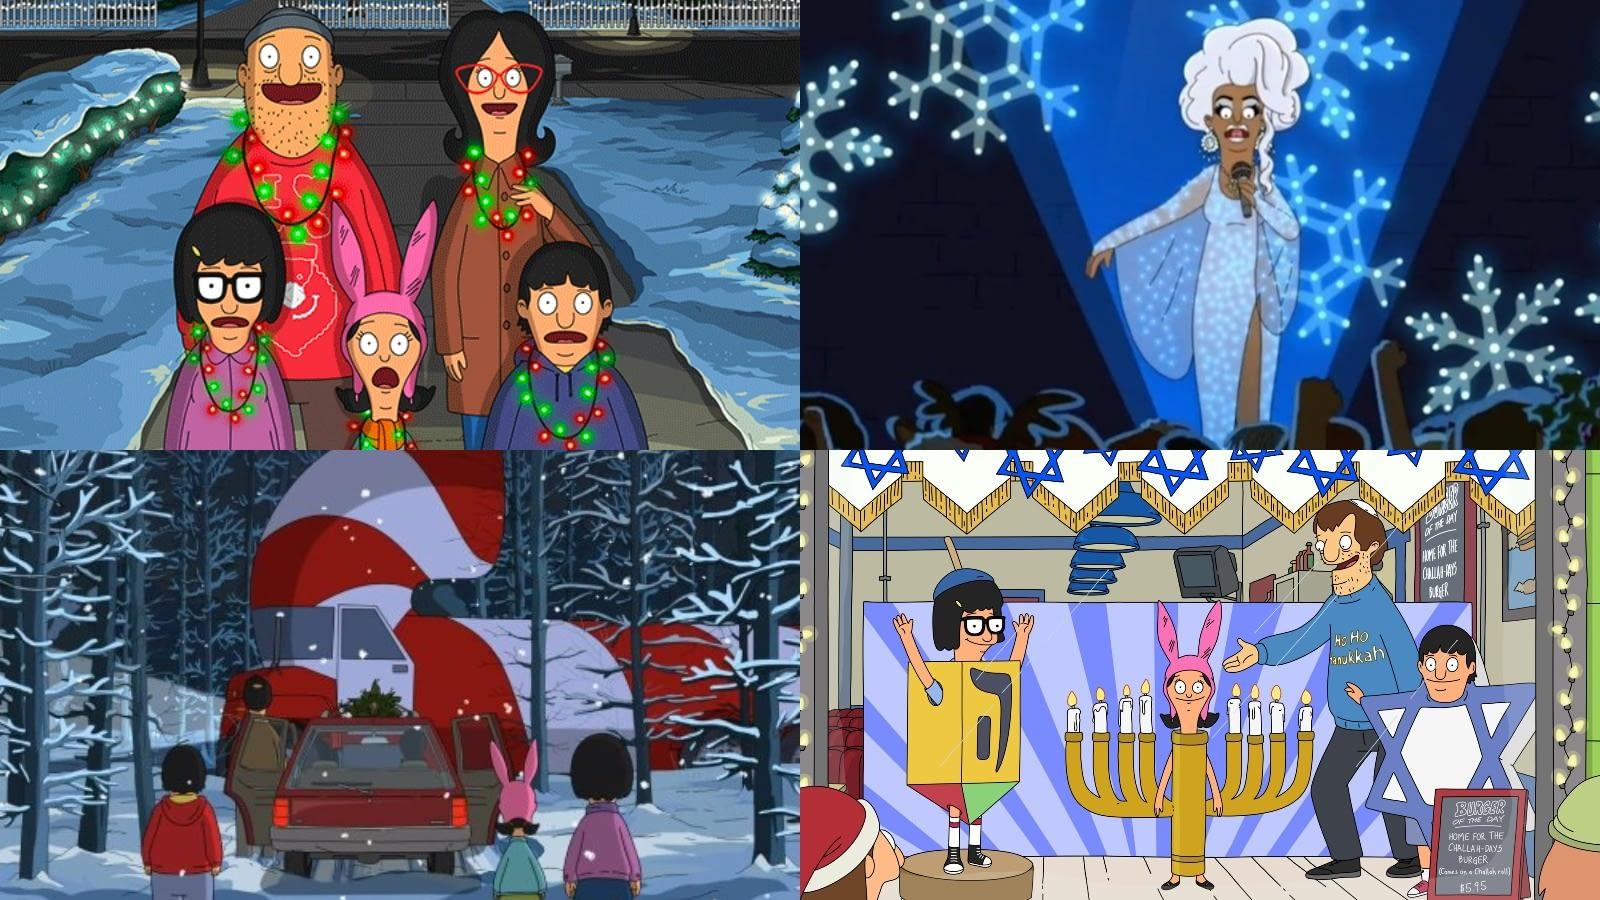 Bobs Burgers Christmas Episodes.Walking In A Belcher Wonderland 7 Bob S Burgers Holiday Favs